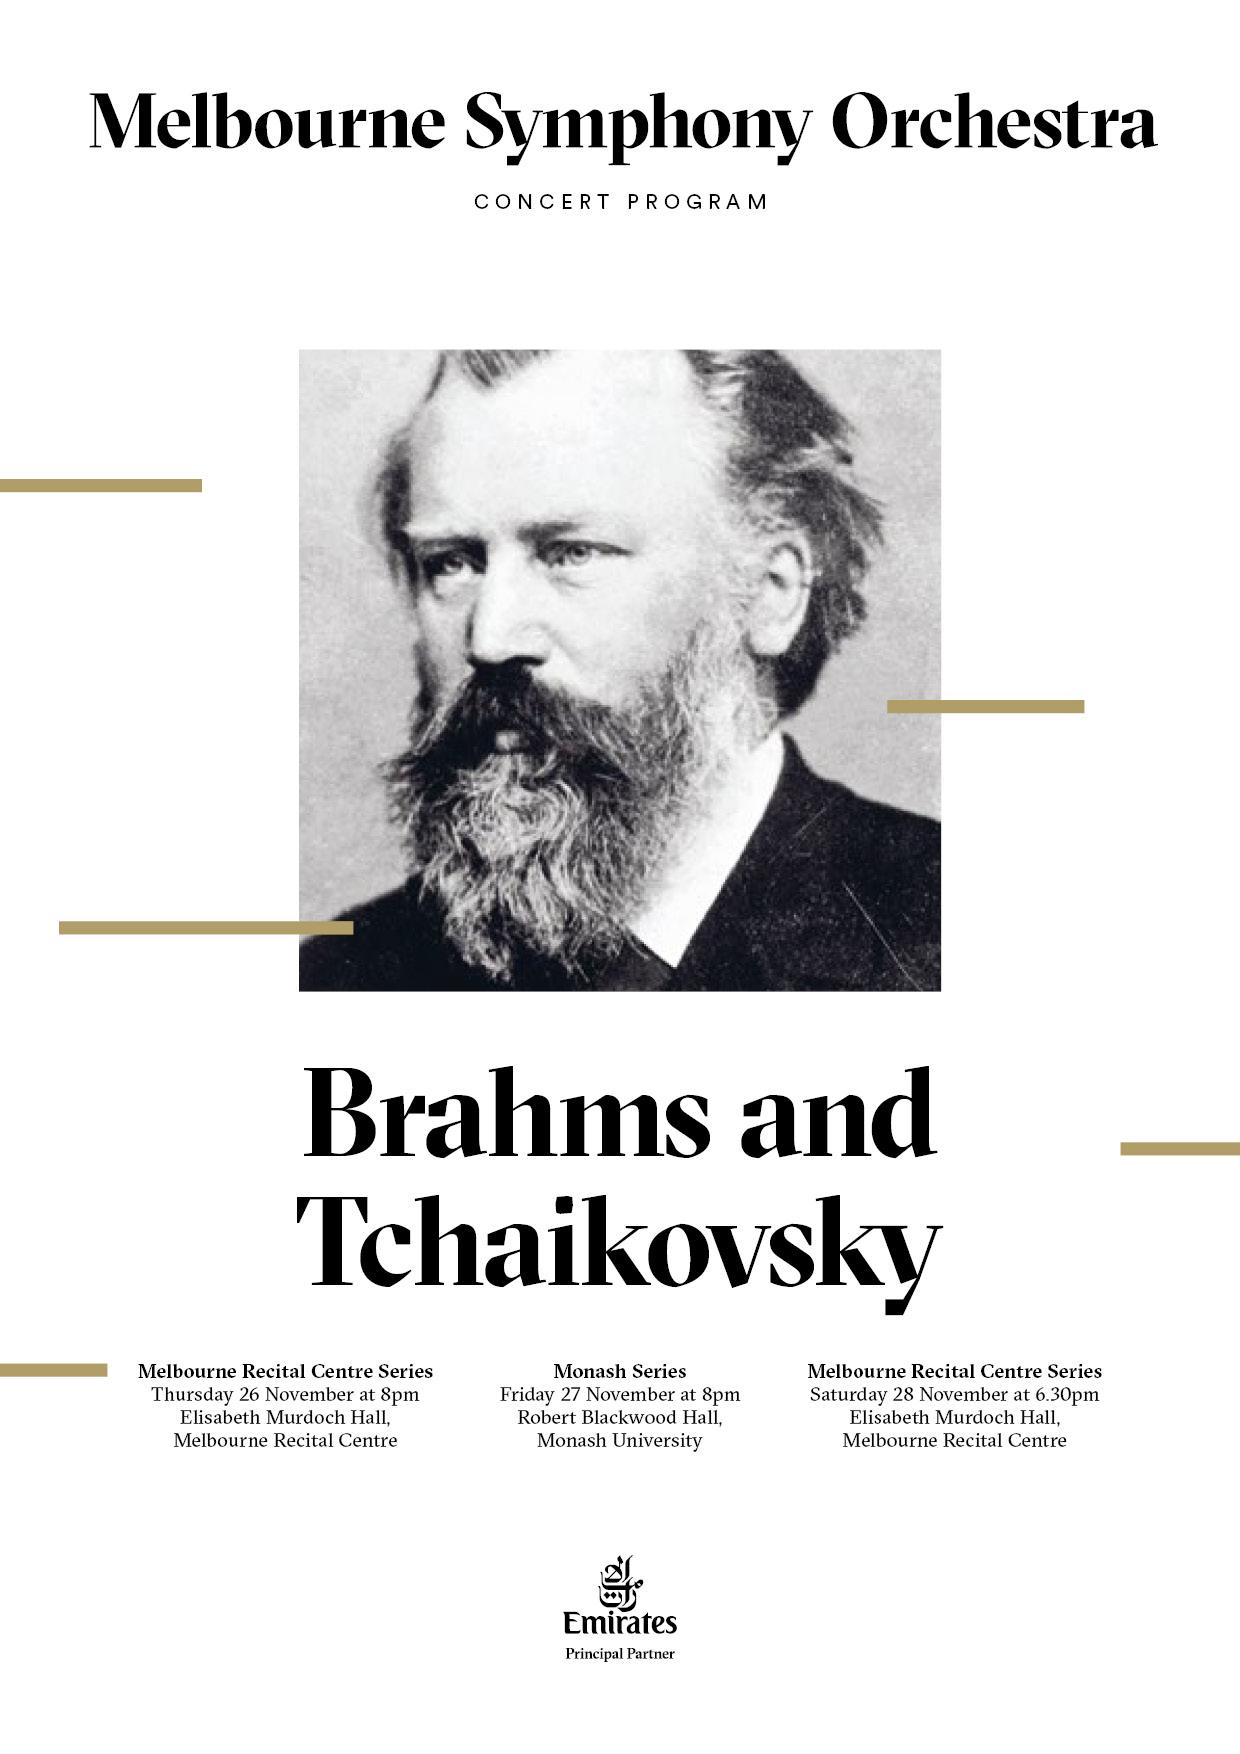 Brahms & Tchaikovsky